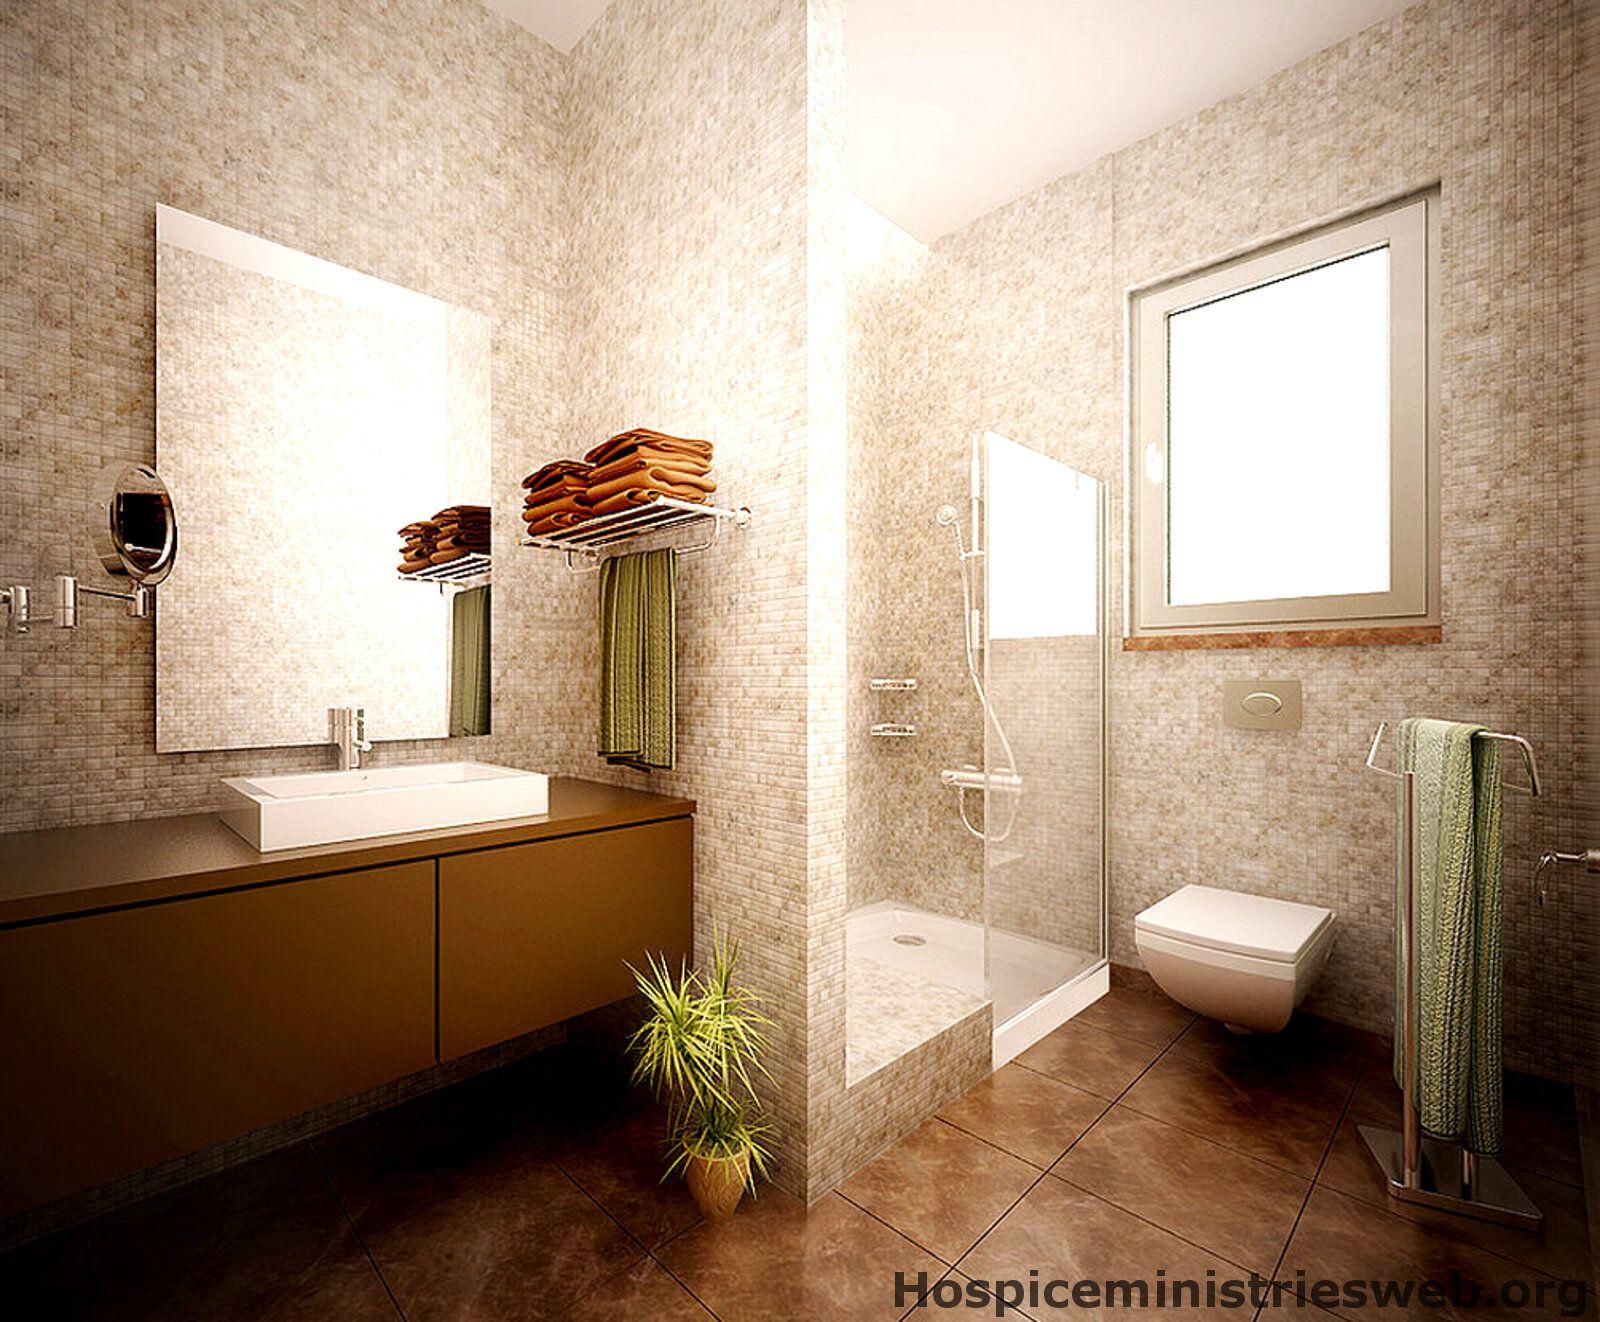 35 Ideen Fur Badezimmer Braun Beige Wohn Ideen Interior Modern Shower